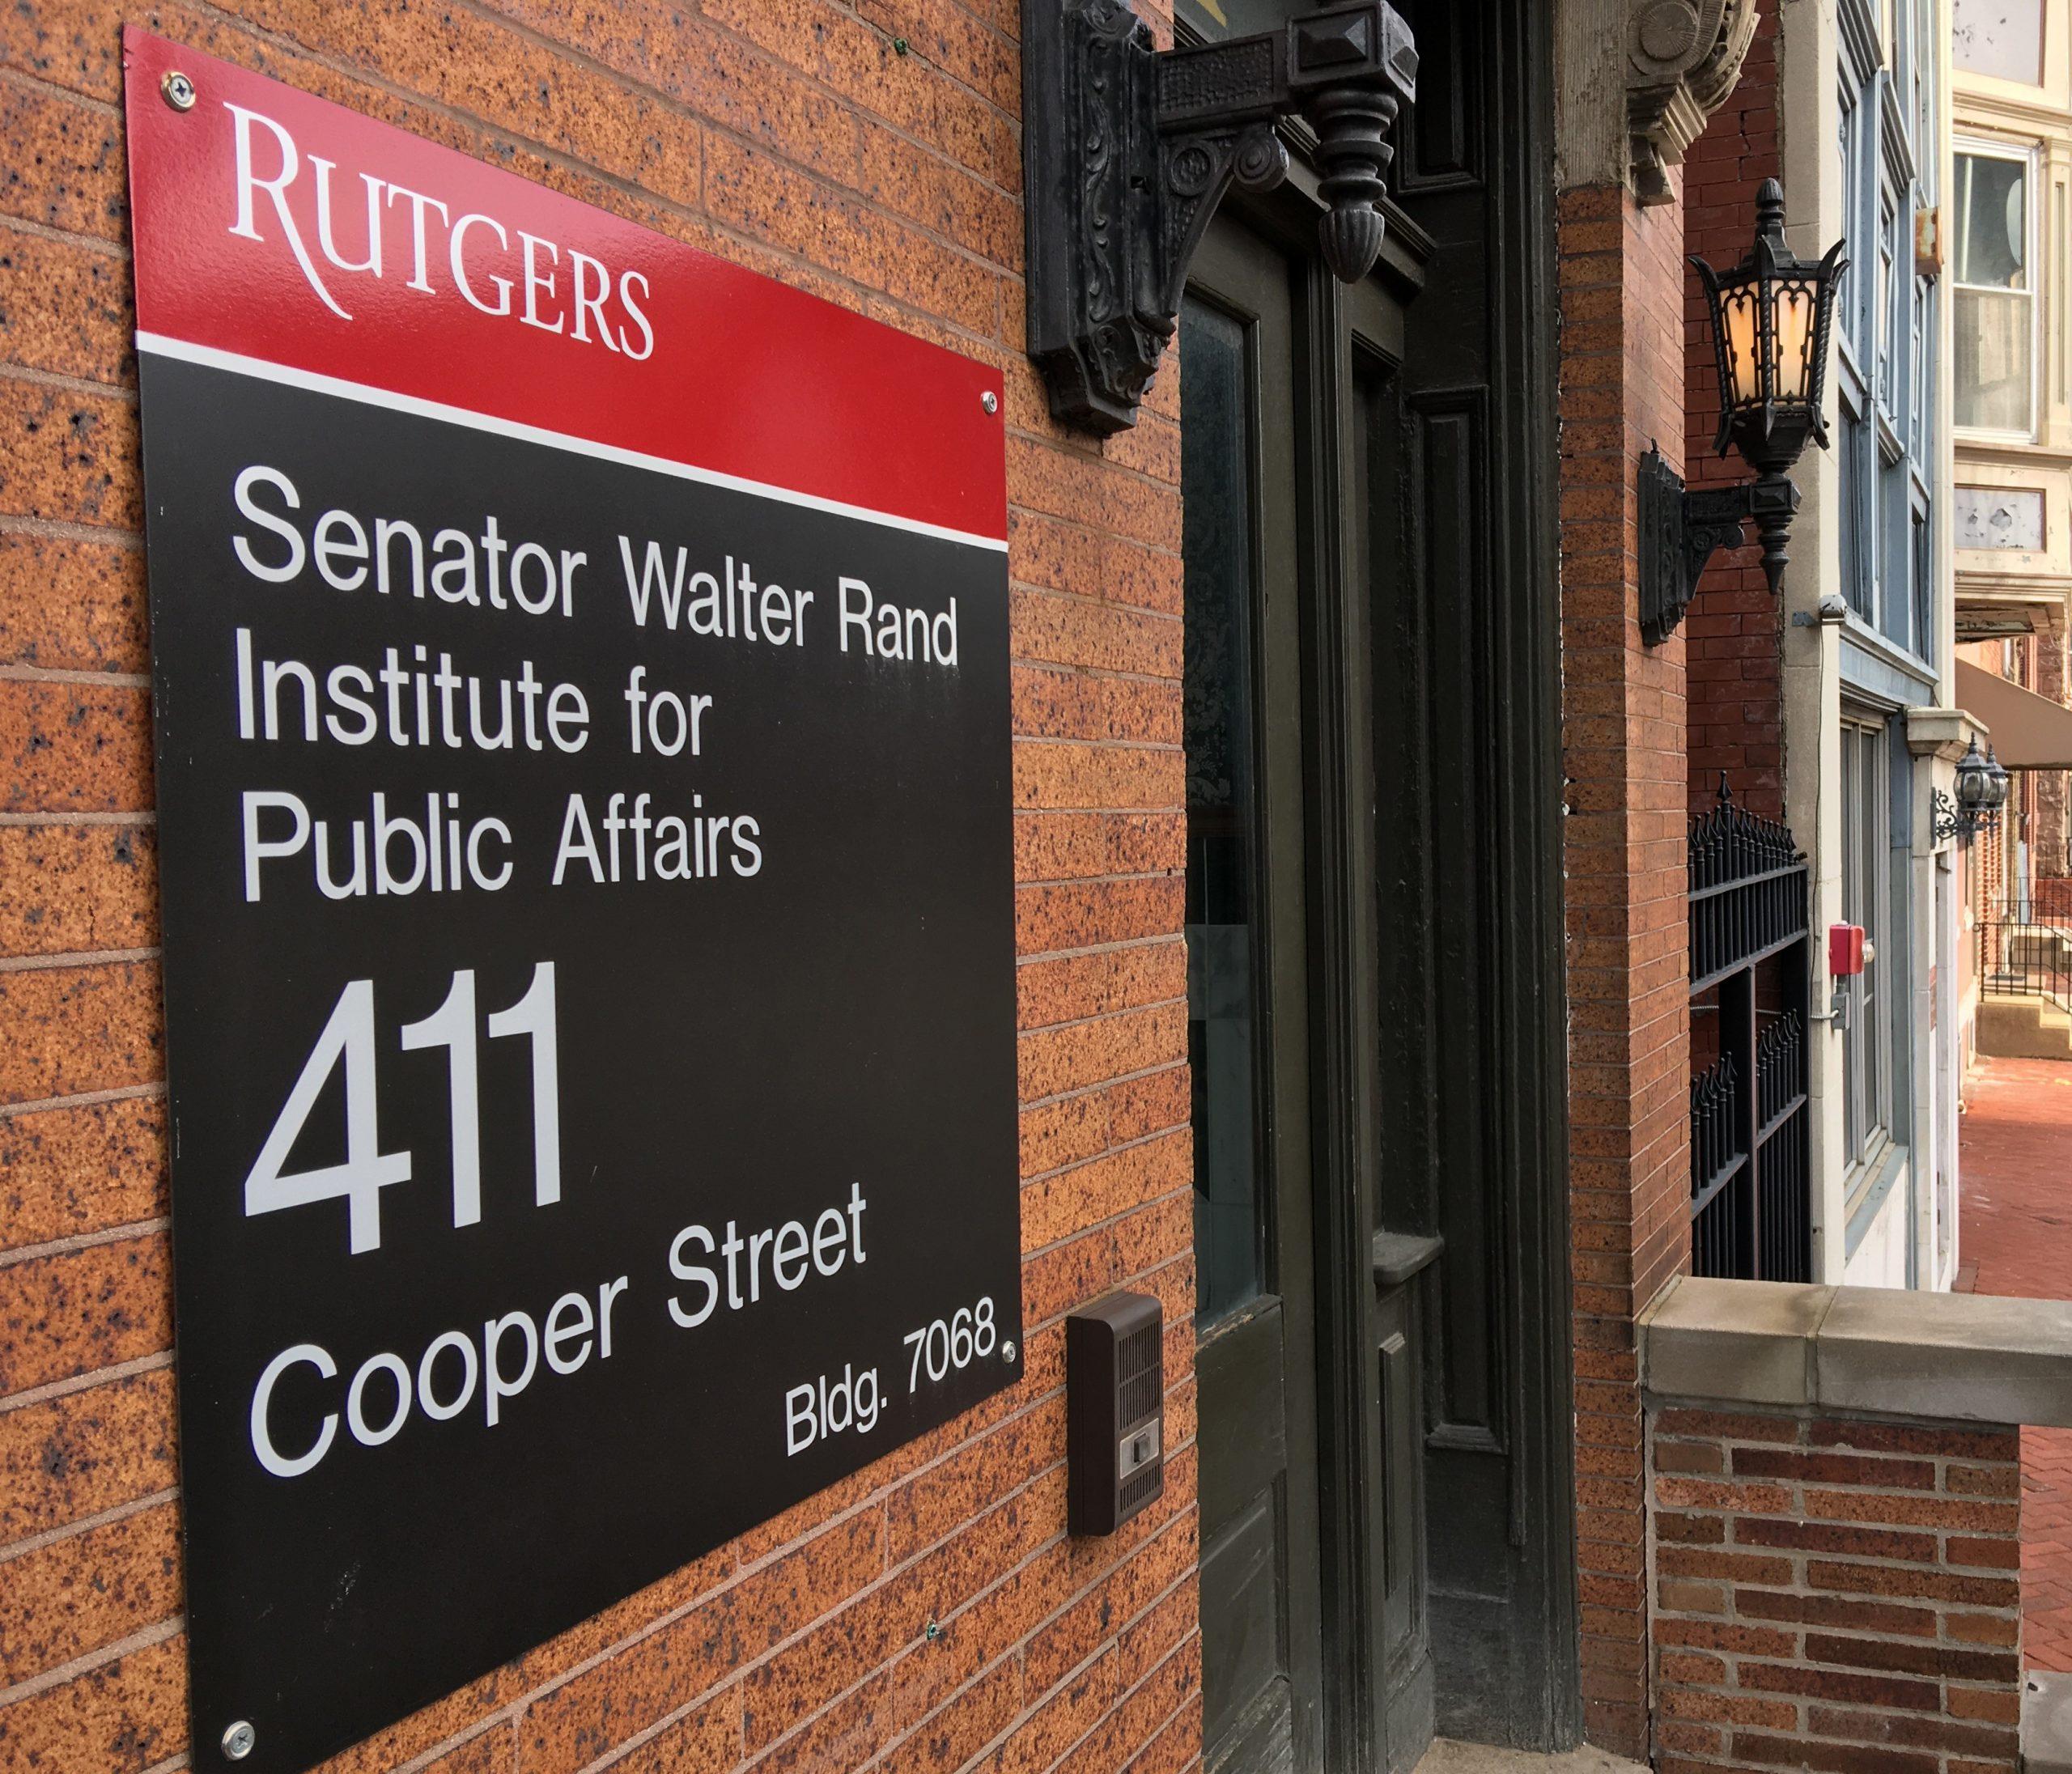 Walter Rand Institute for Public Affairs